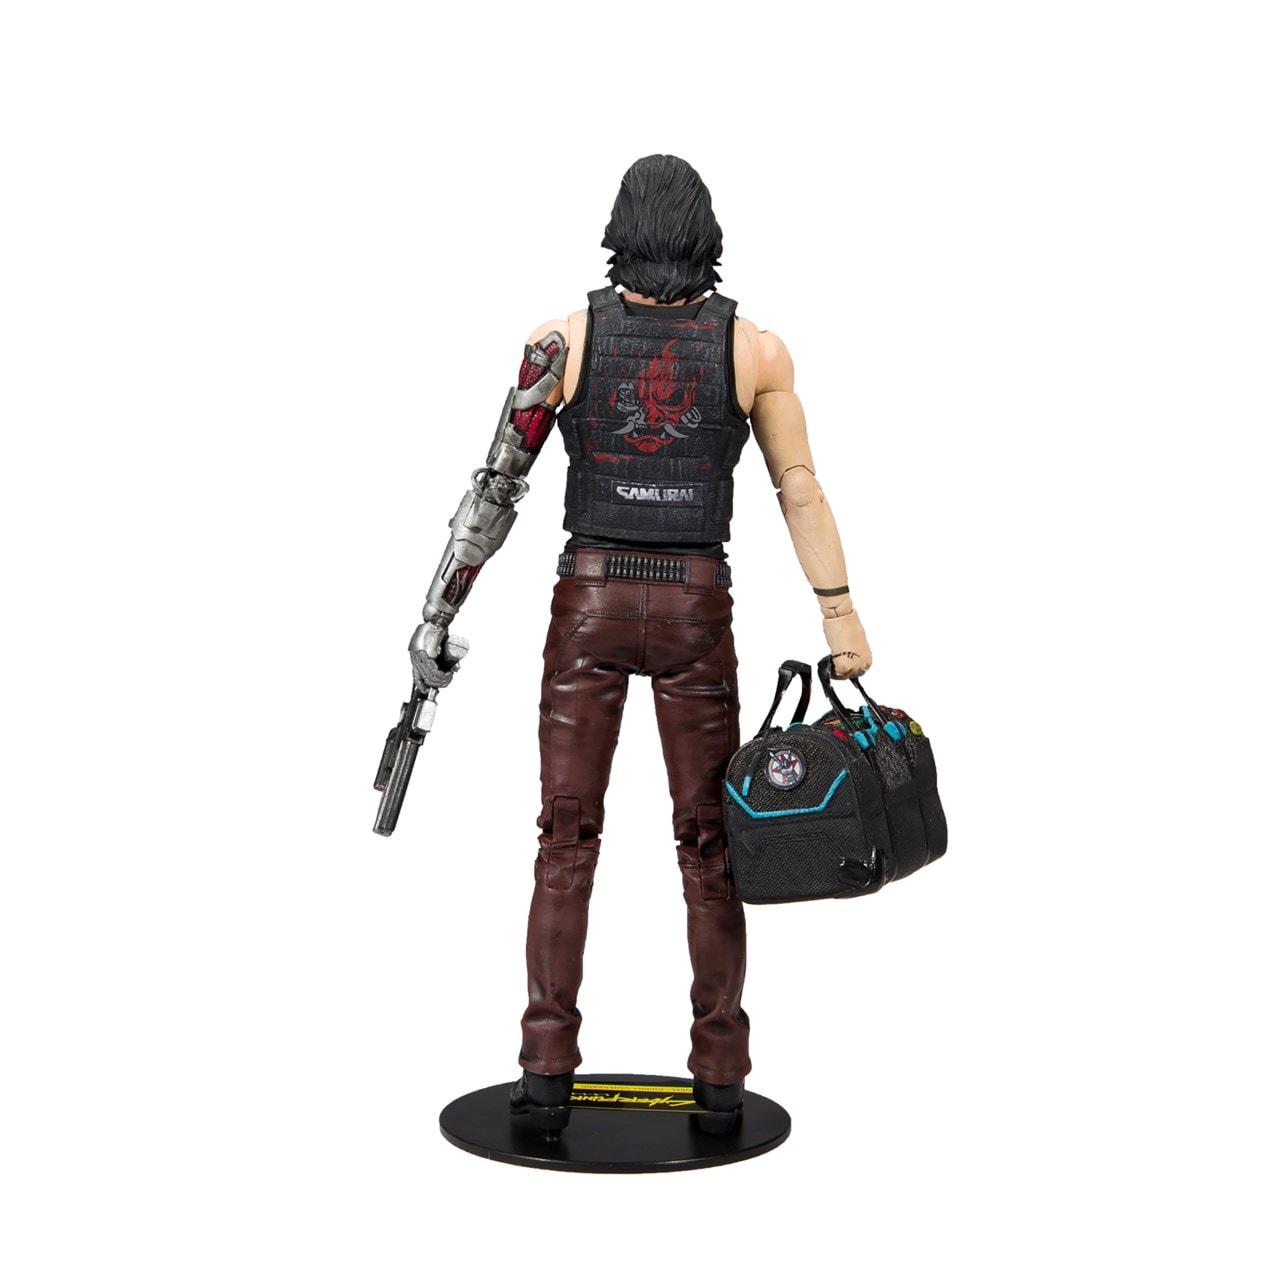 Cyberpunk 2077: Johnny Silverhand (Variant) Figurine - 3